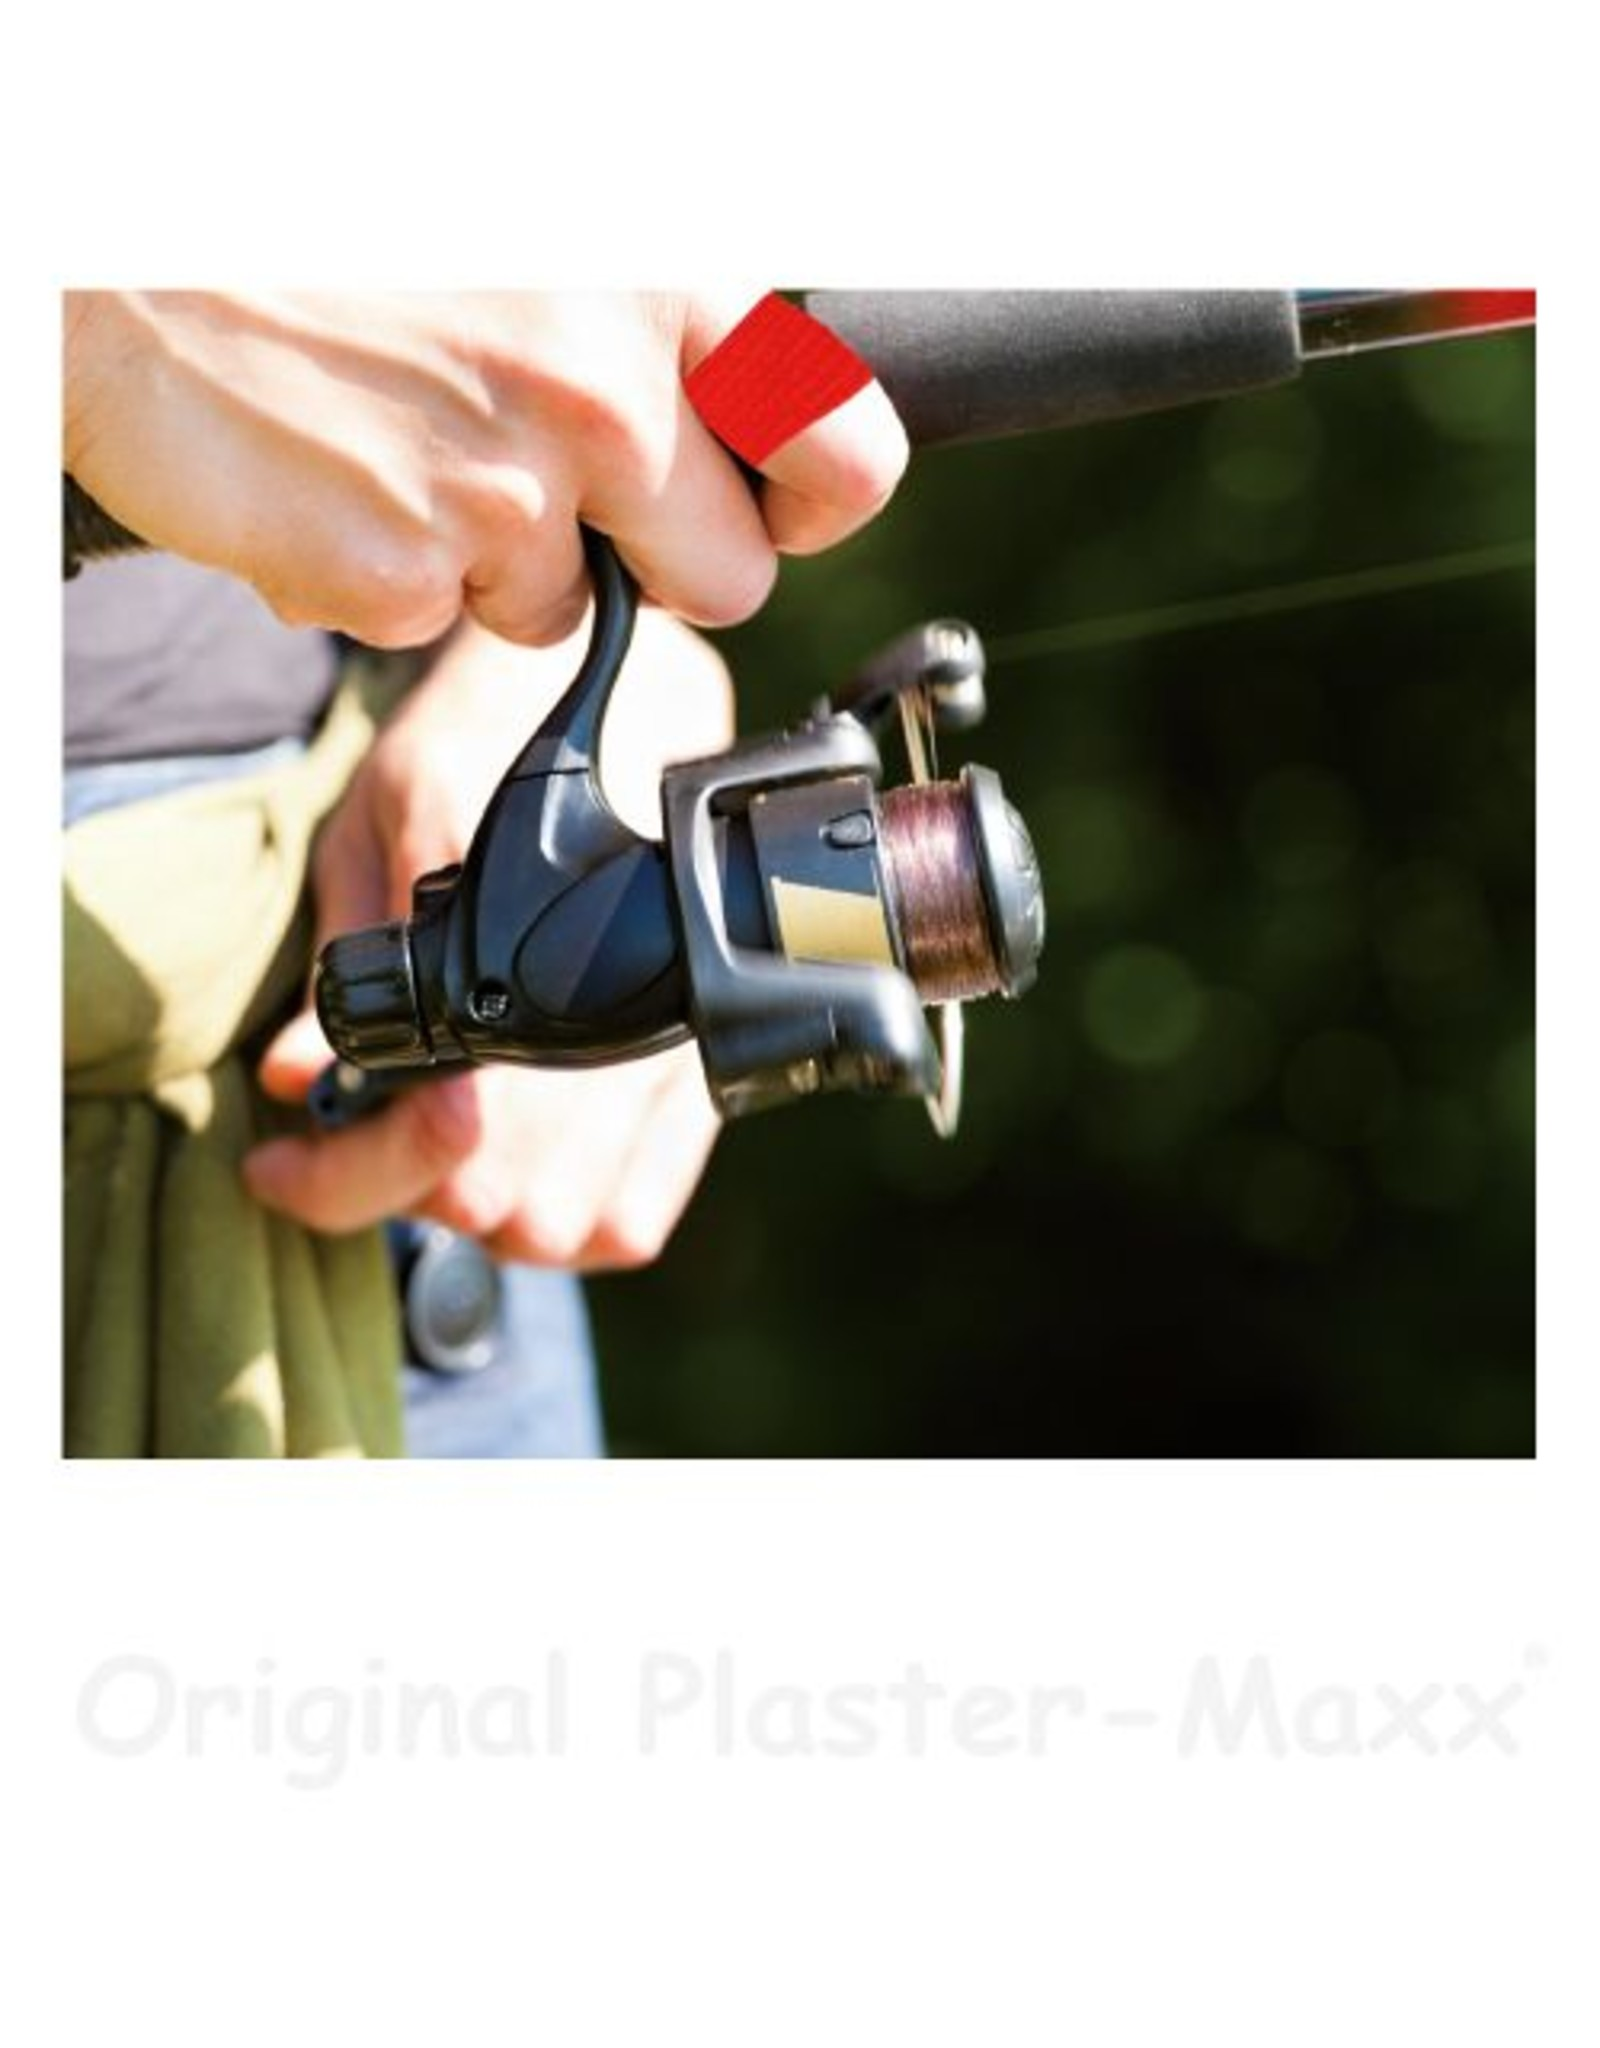 Plaster-Maxx Plaster-Maxx - Sparset 1xHaut, 1xViolett, 1xPink